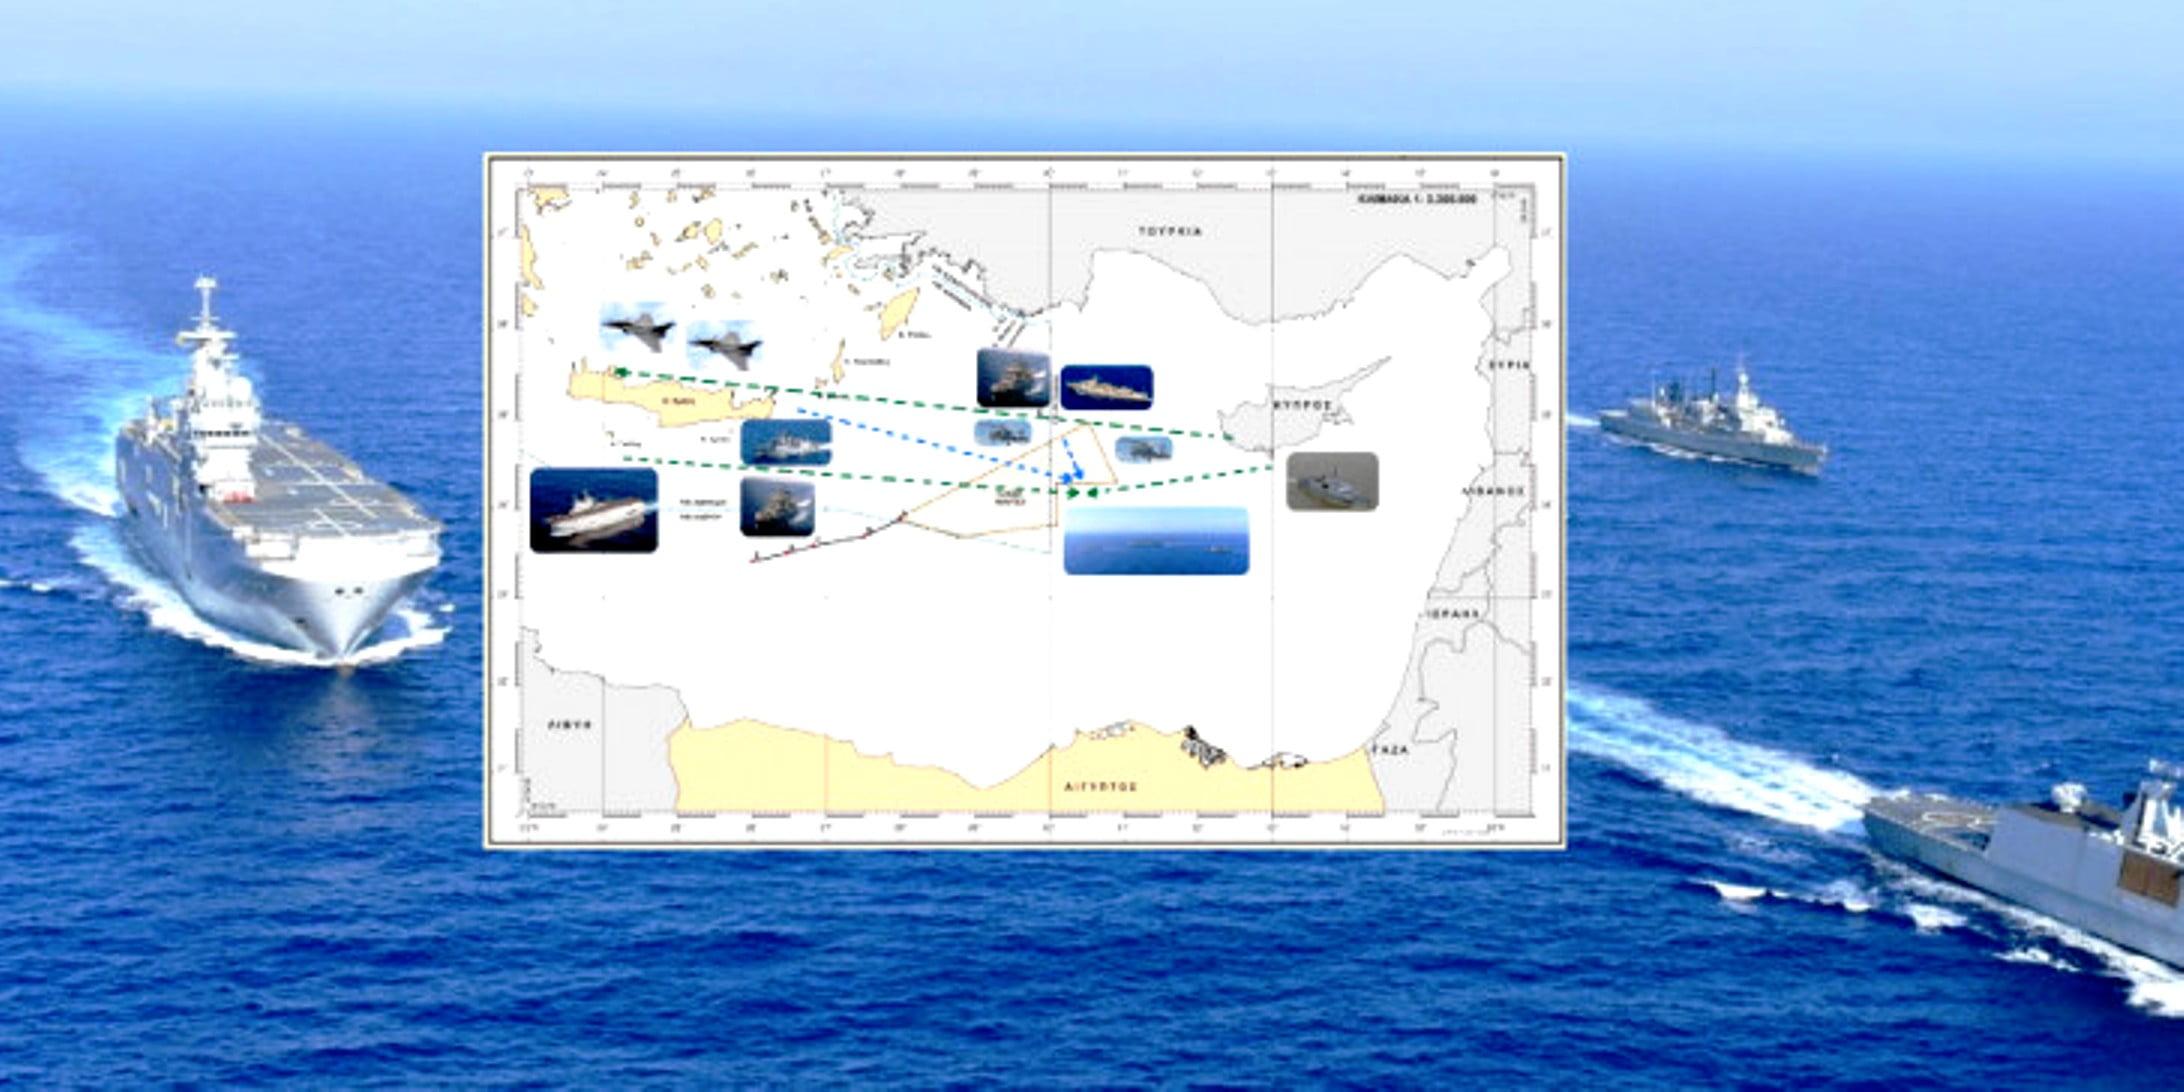 Le Figaro: Τι είδε το γαλλικό πλοίο Tonnerre στις έρευνες του Oruc Reis